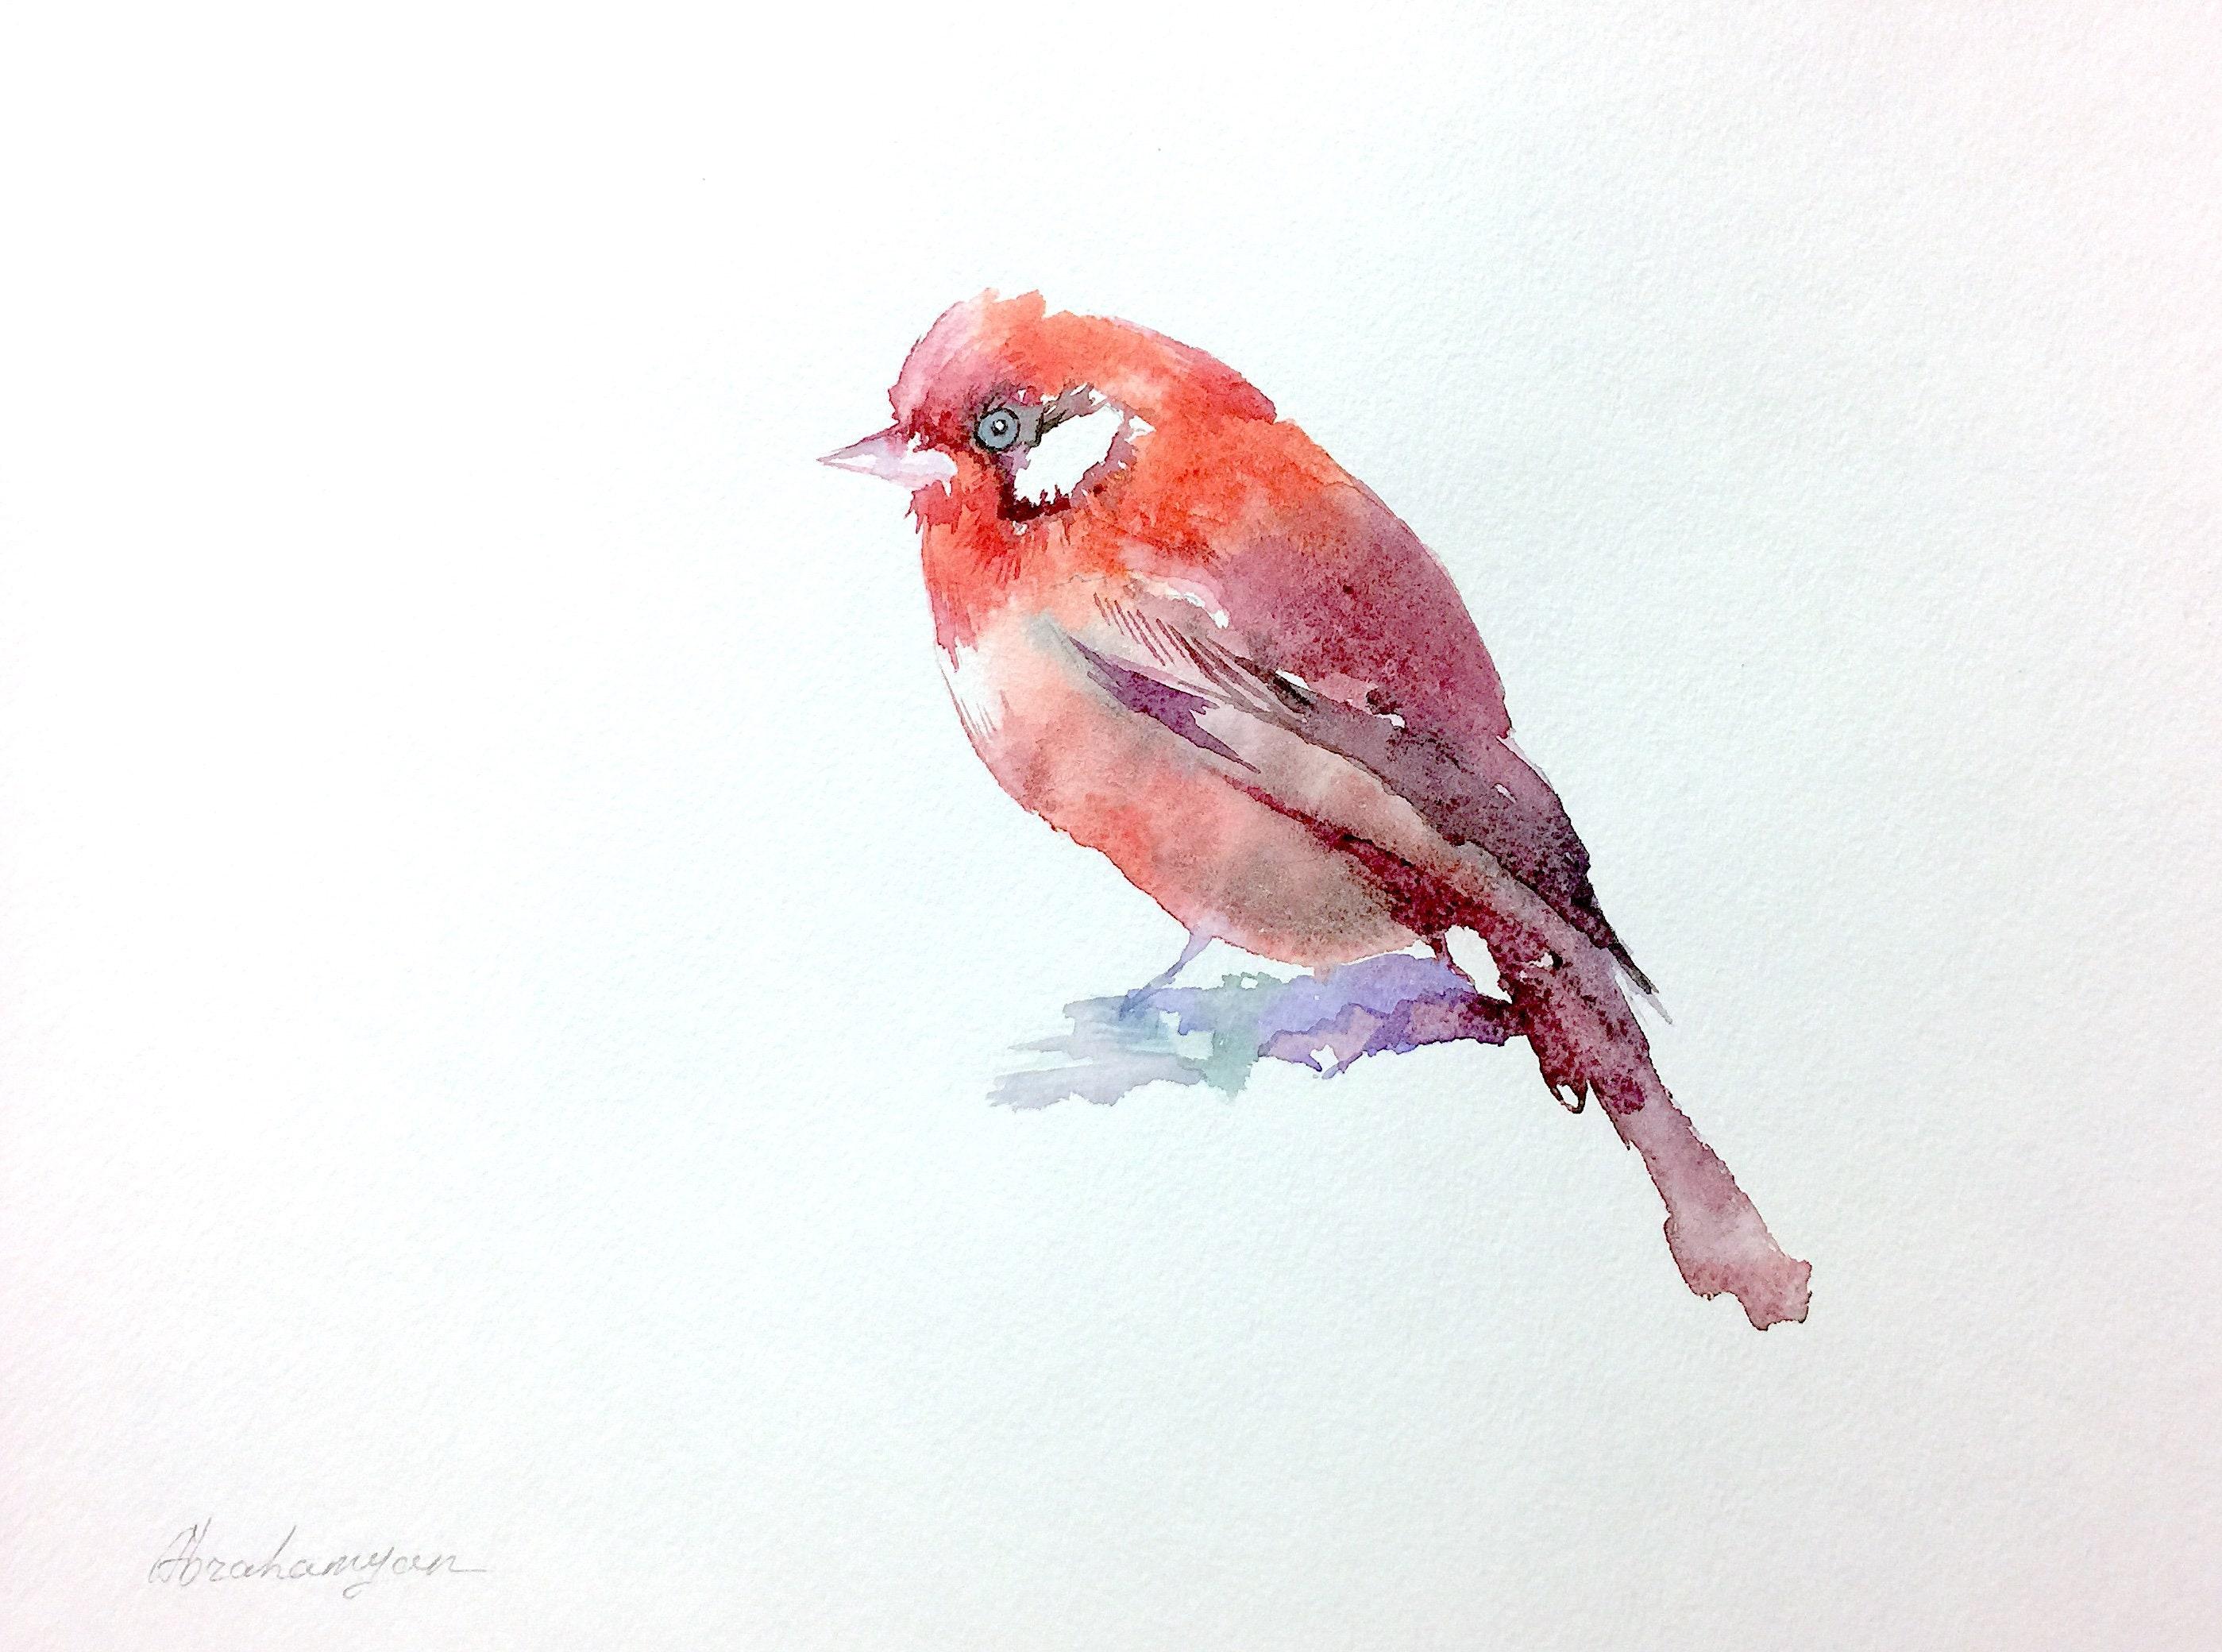 Watercolor artwork Birds Cardinal signed Handmade painting Illustration wall